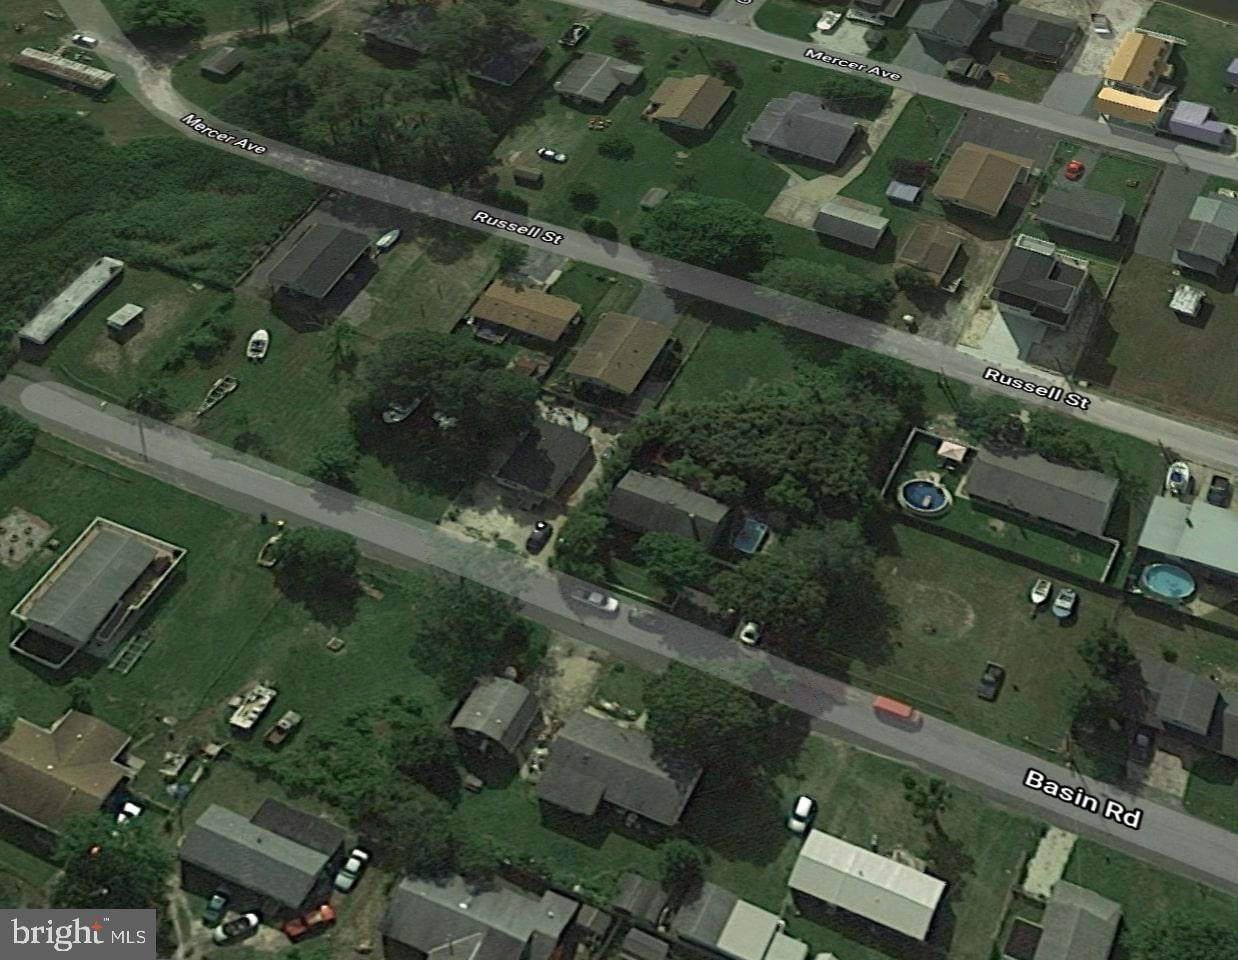 Lot 62 Basin Road - Photo 1